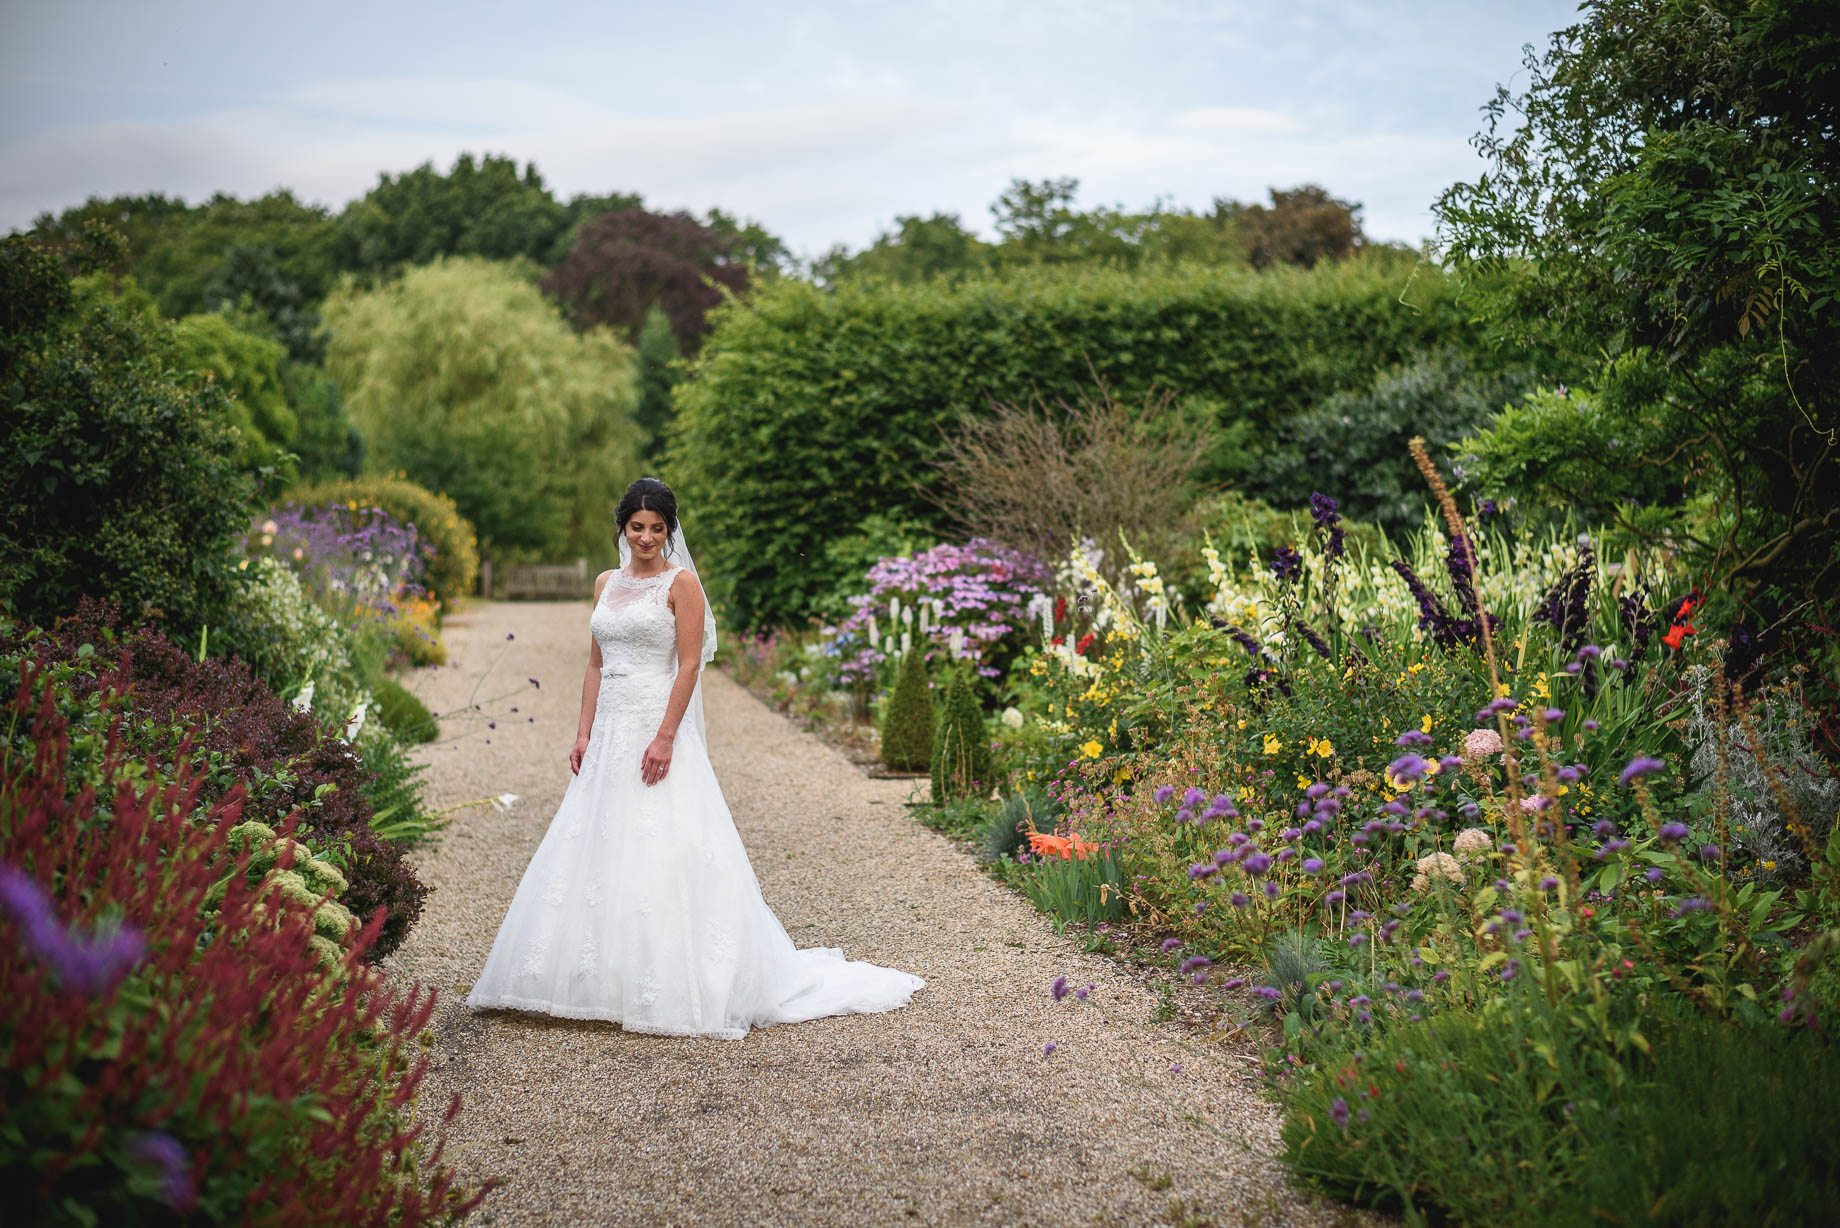 Gaynes Park wedding photography - Guy Collier Photography - Rachel and Jon (140 of 169)